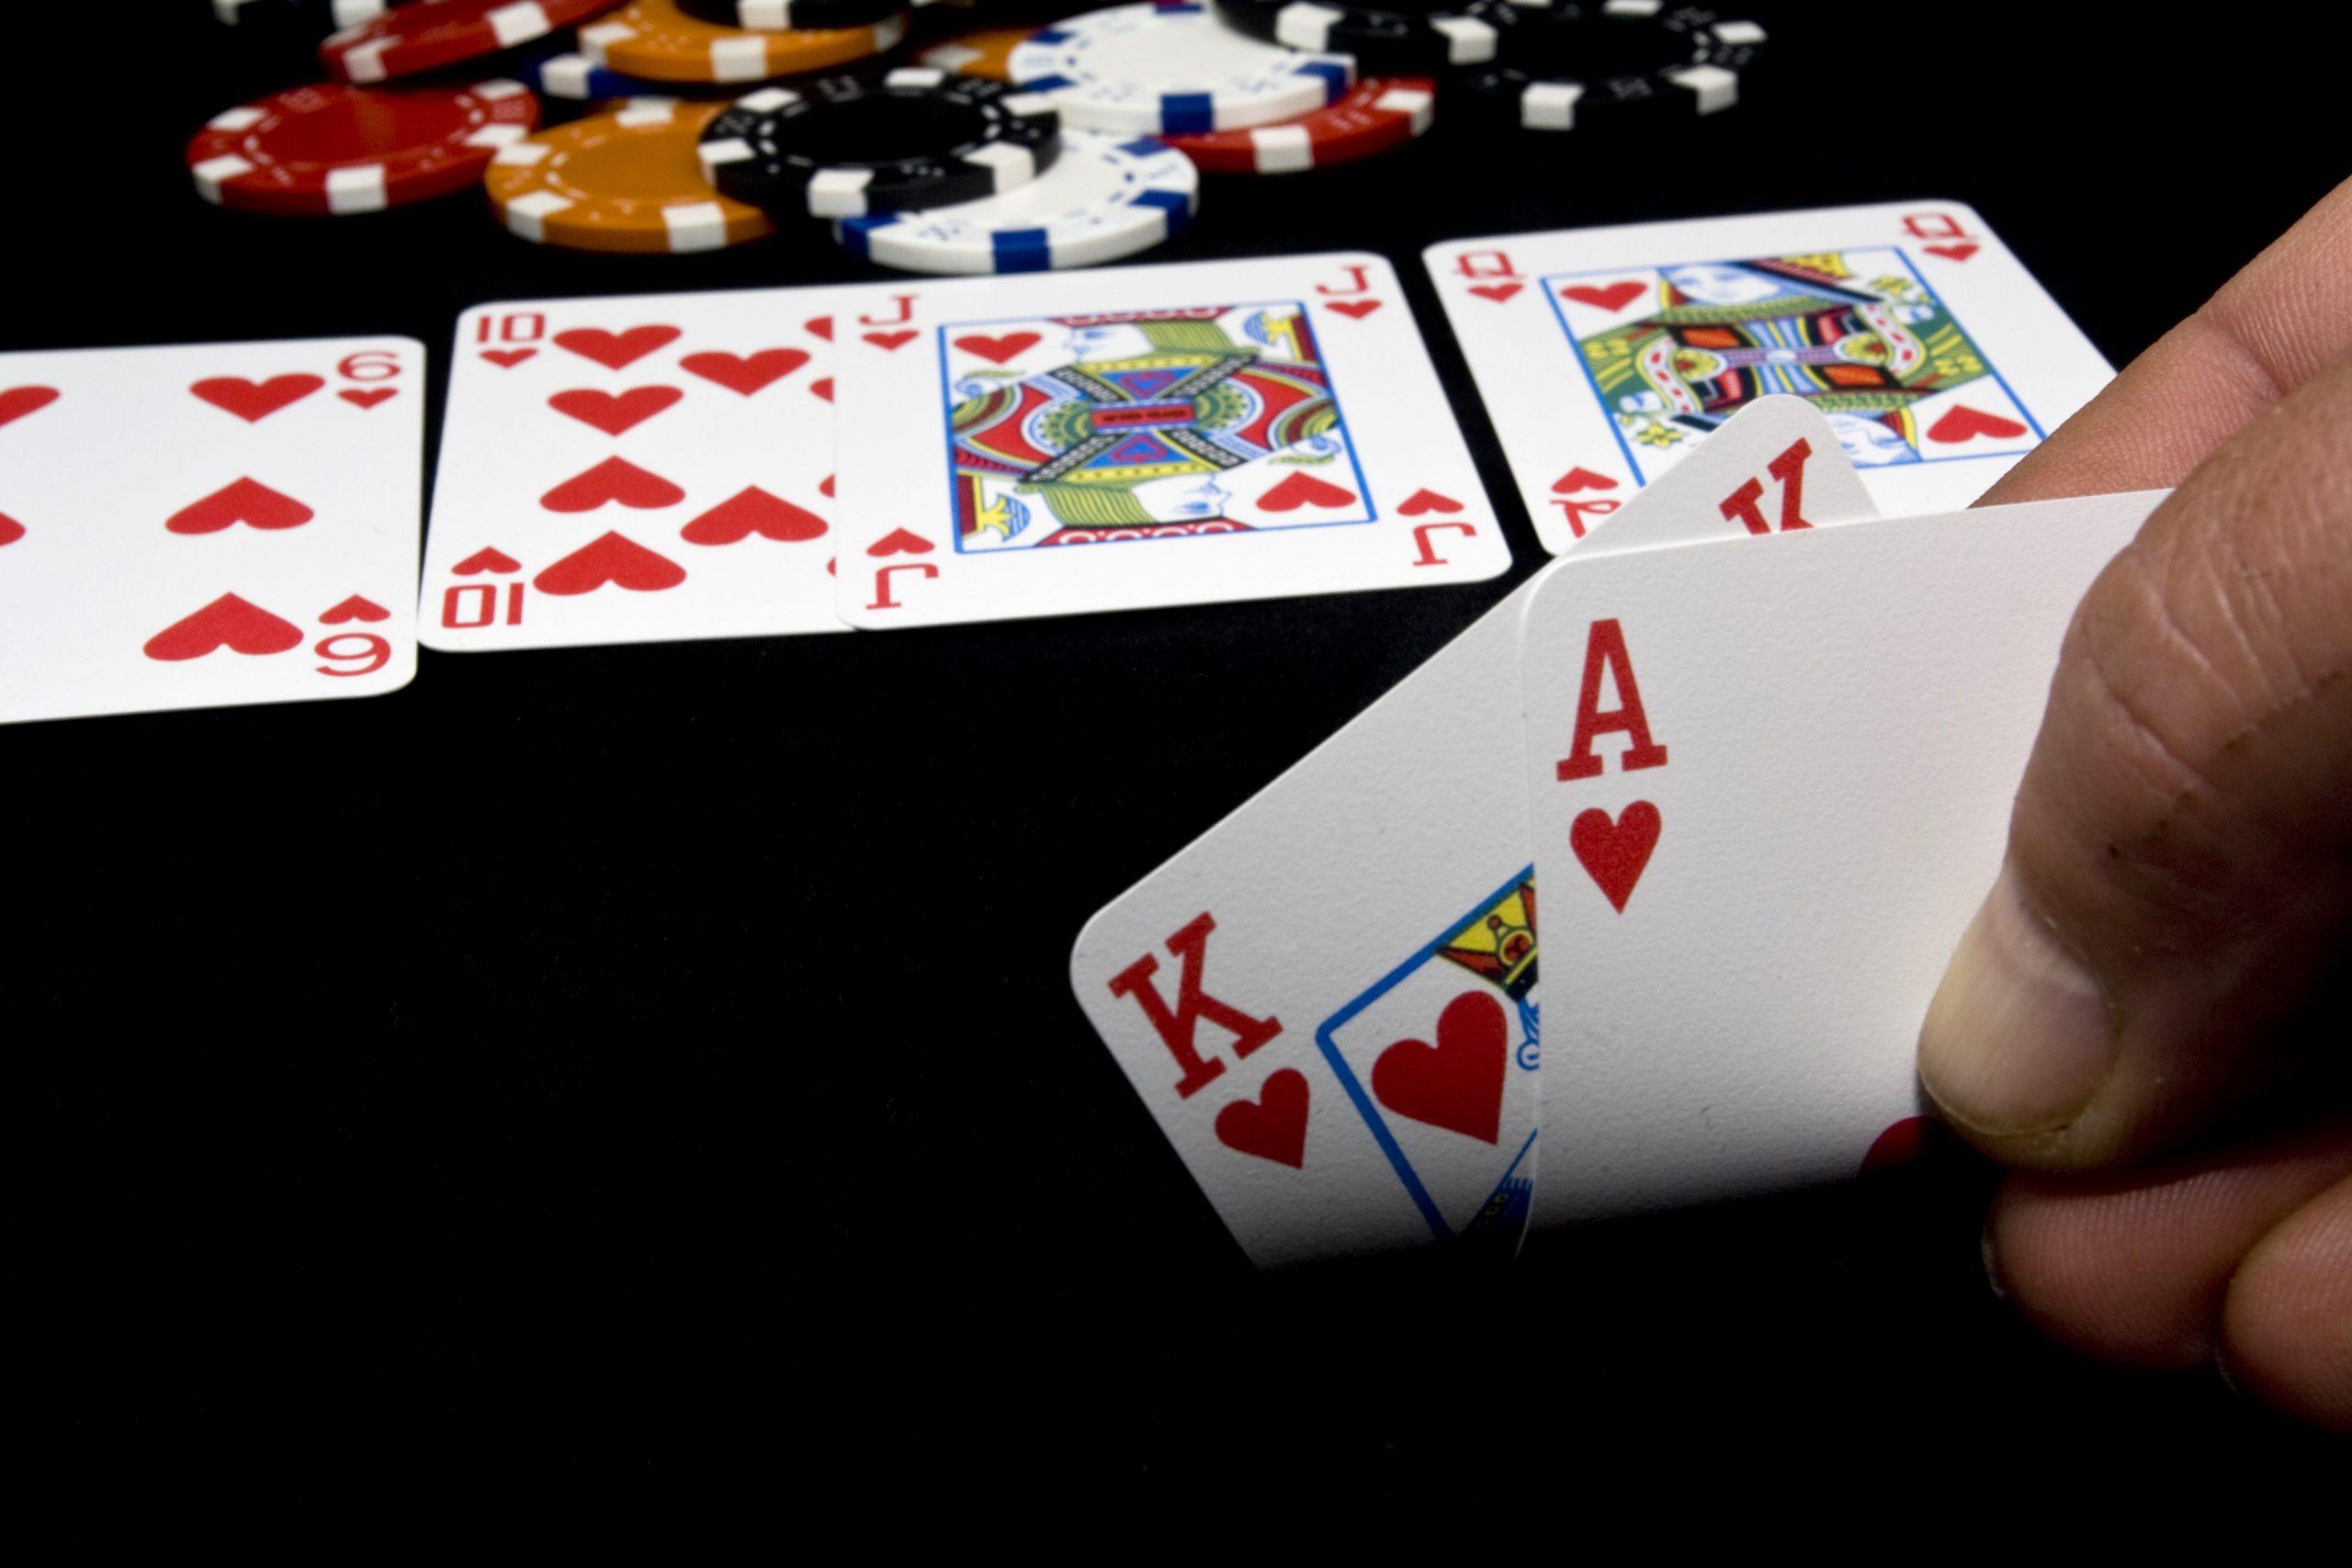 Mystic lake sports betting michigan notre-dame 2021 betting line